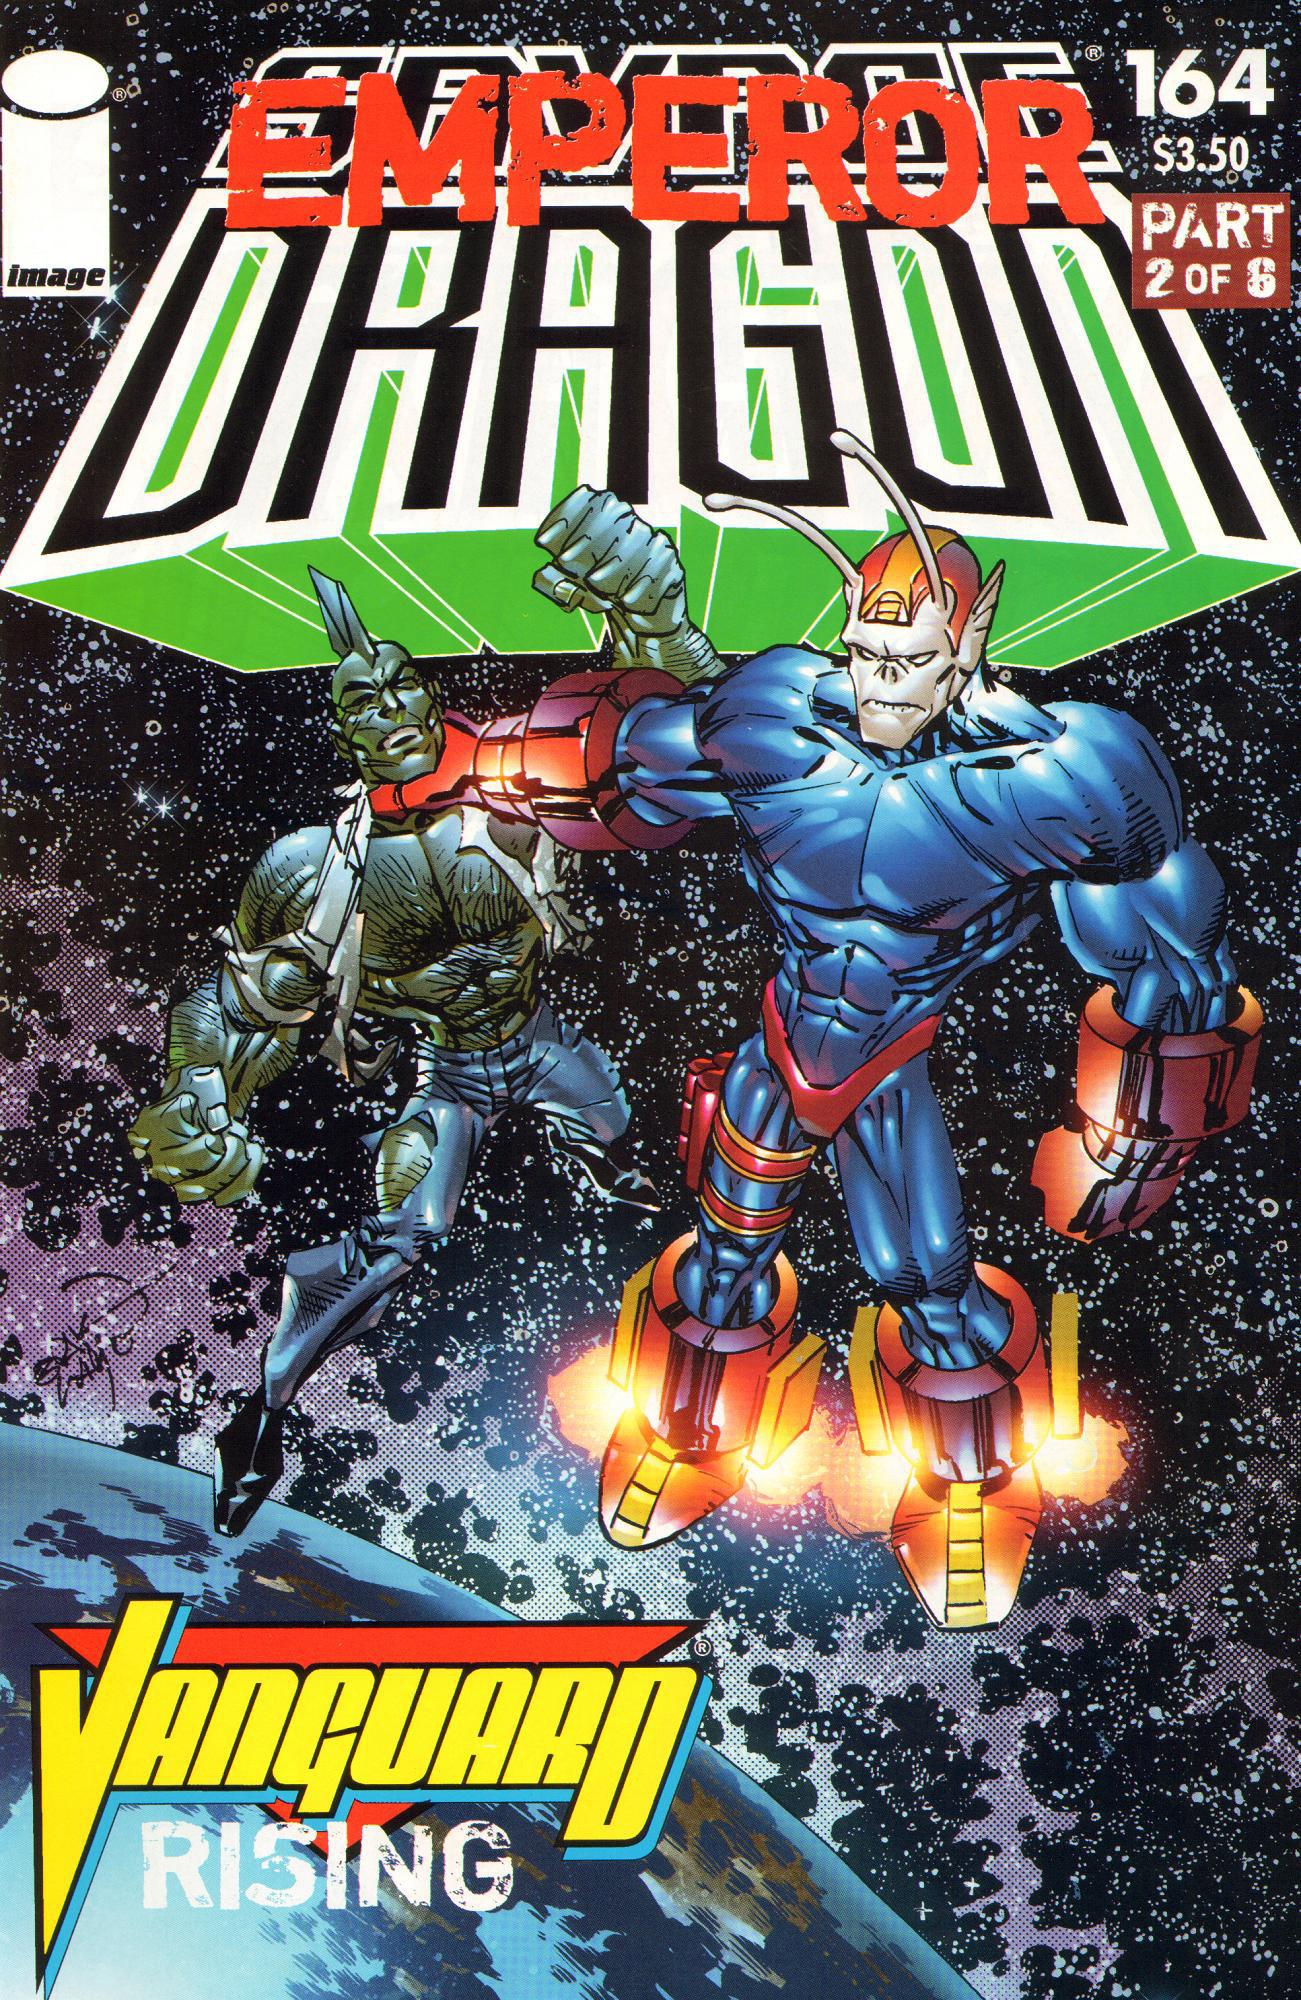 Cover Savage Dragon Vol.2 #164